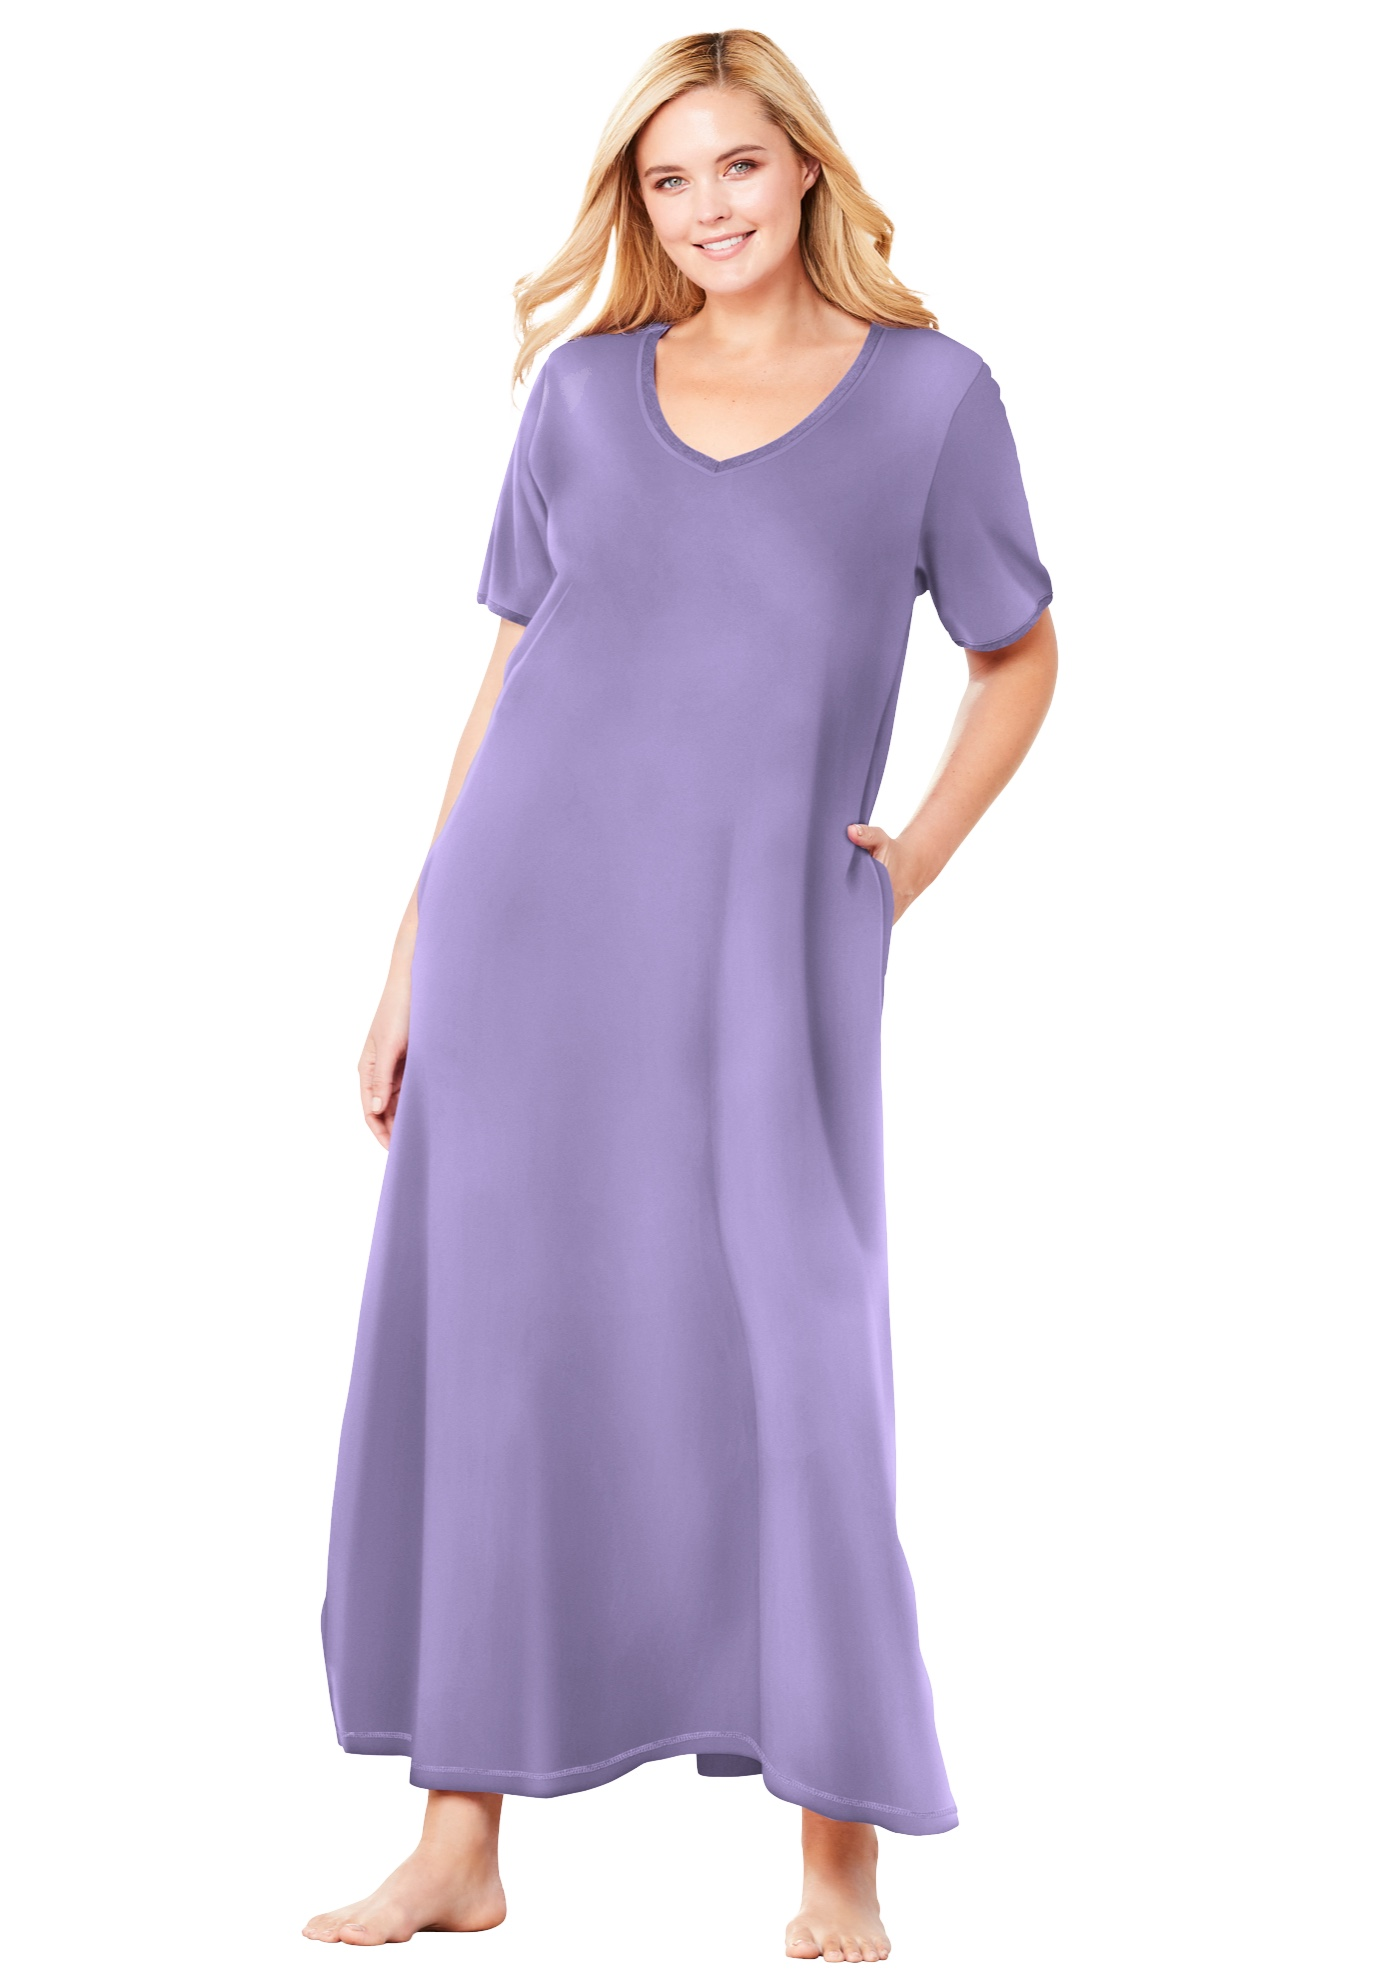 Womens Plus Size Long T-Shirt Lounger Dreams /& Co